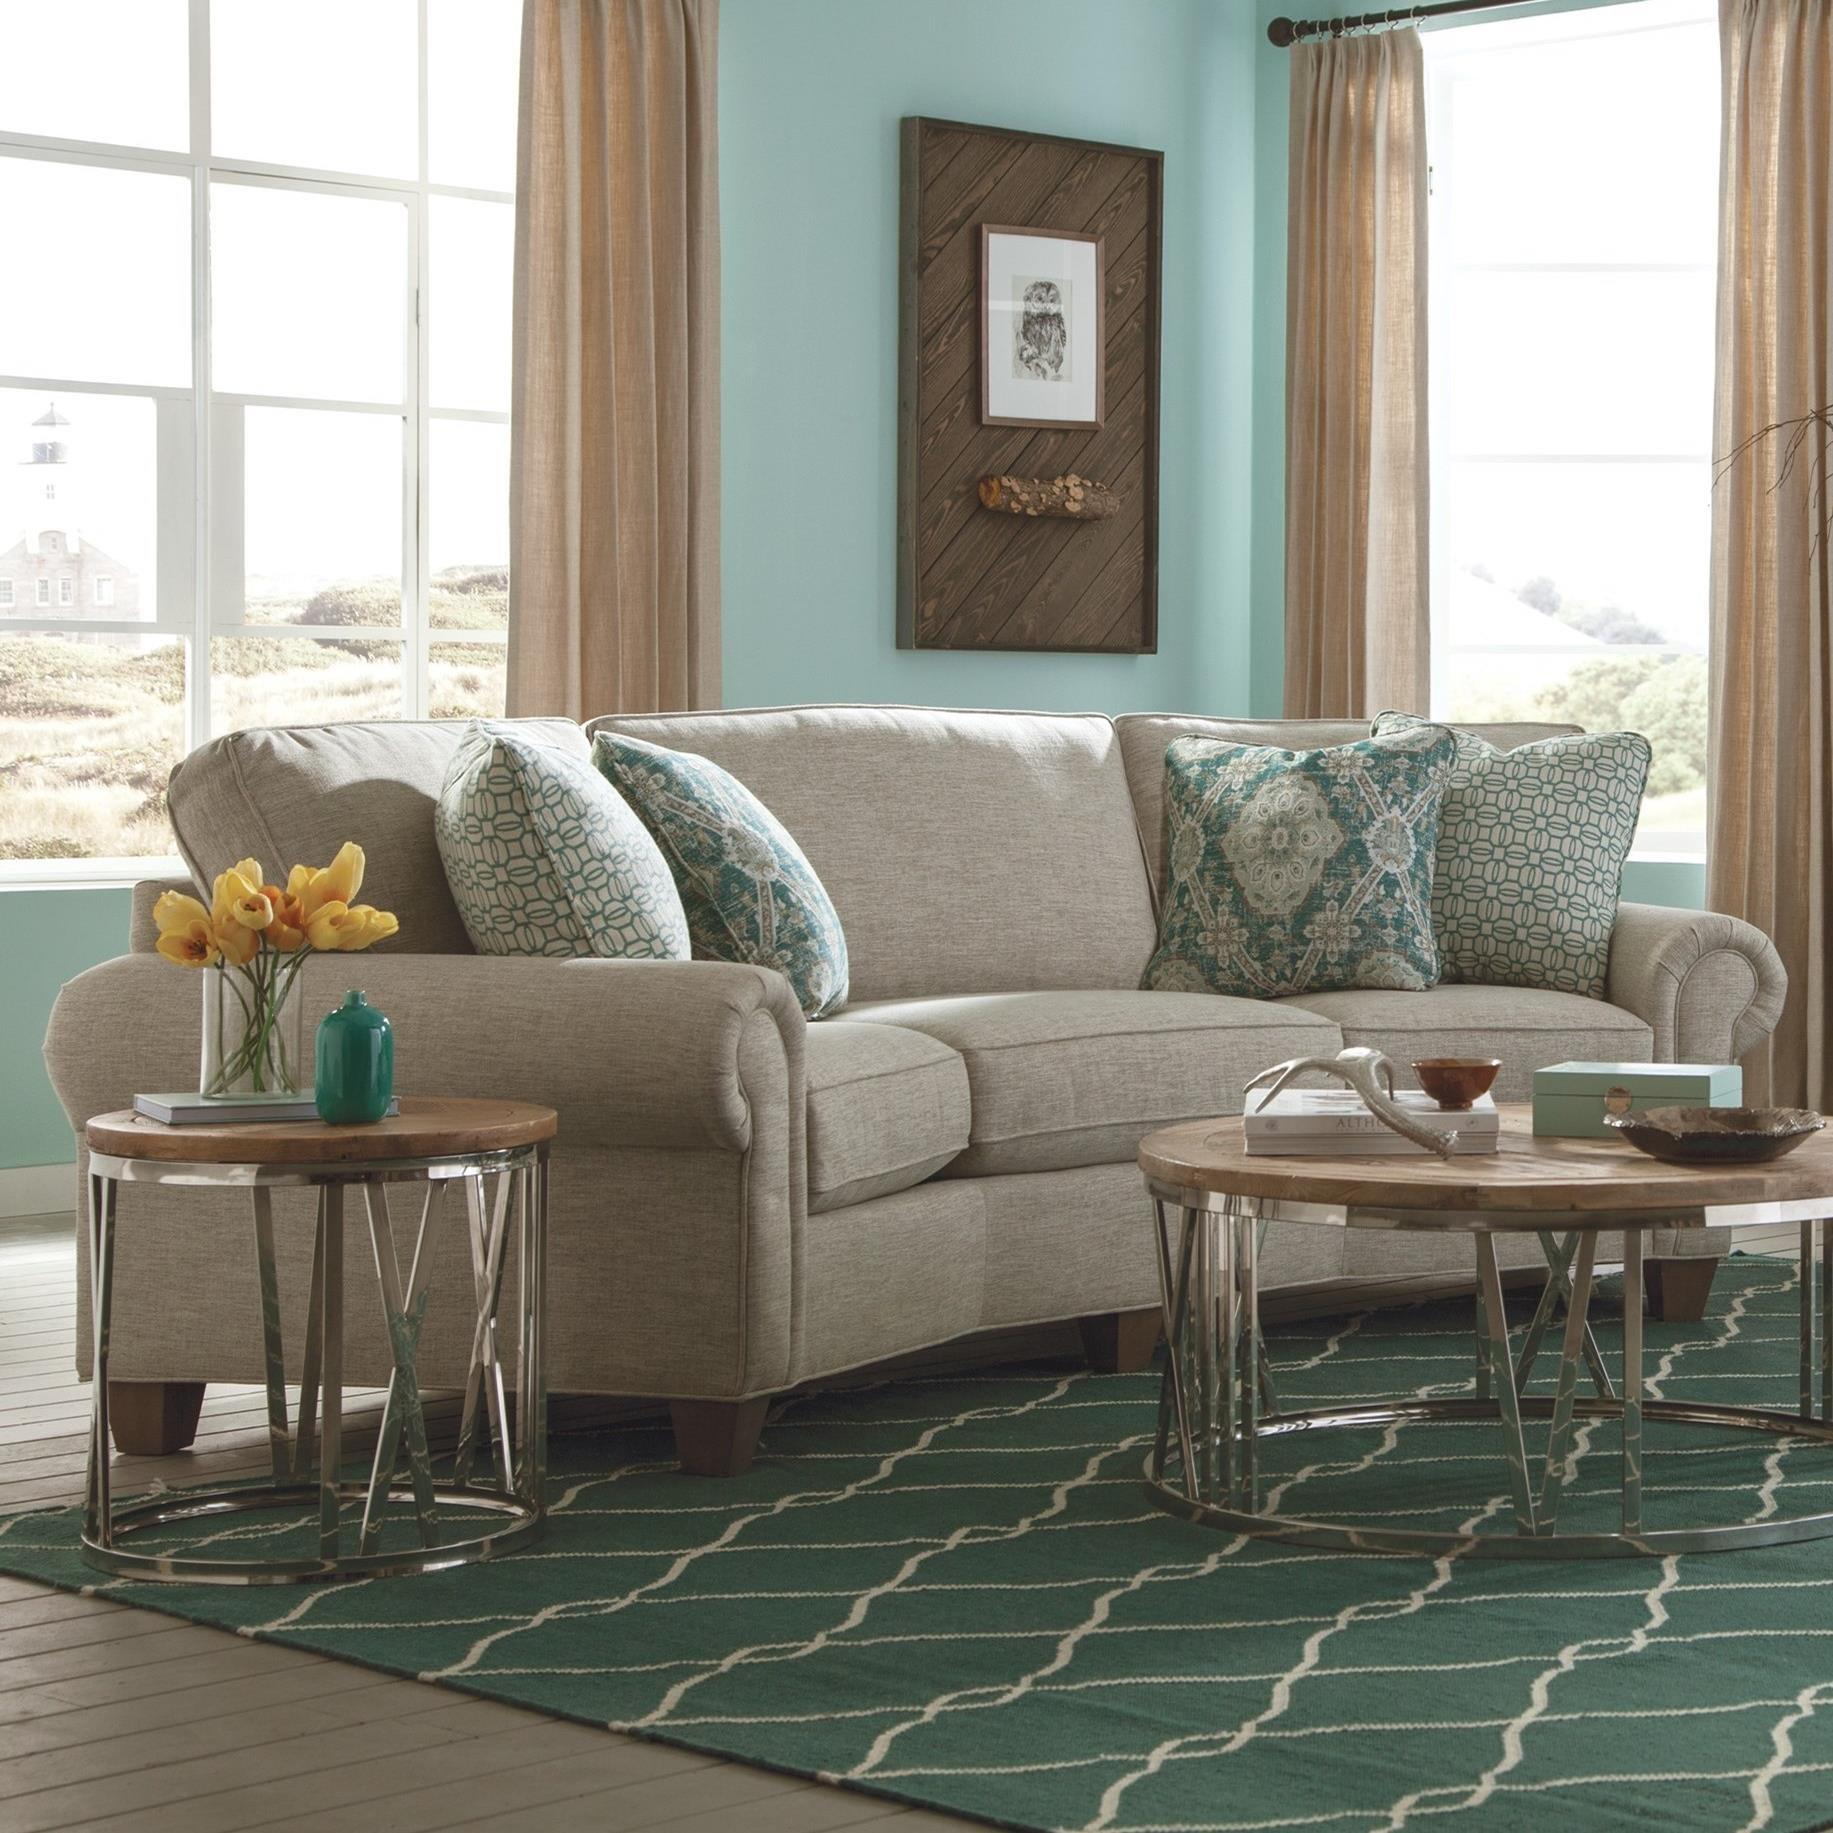 craftmaster c9 custom collection customizable conversation sofa rh broyhillofdenver com